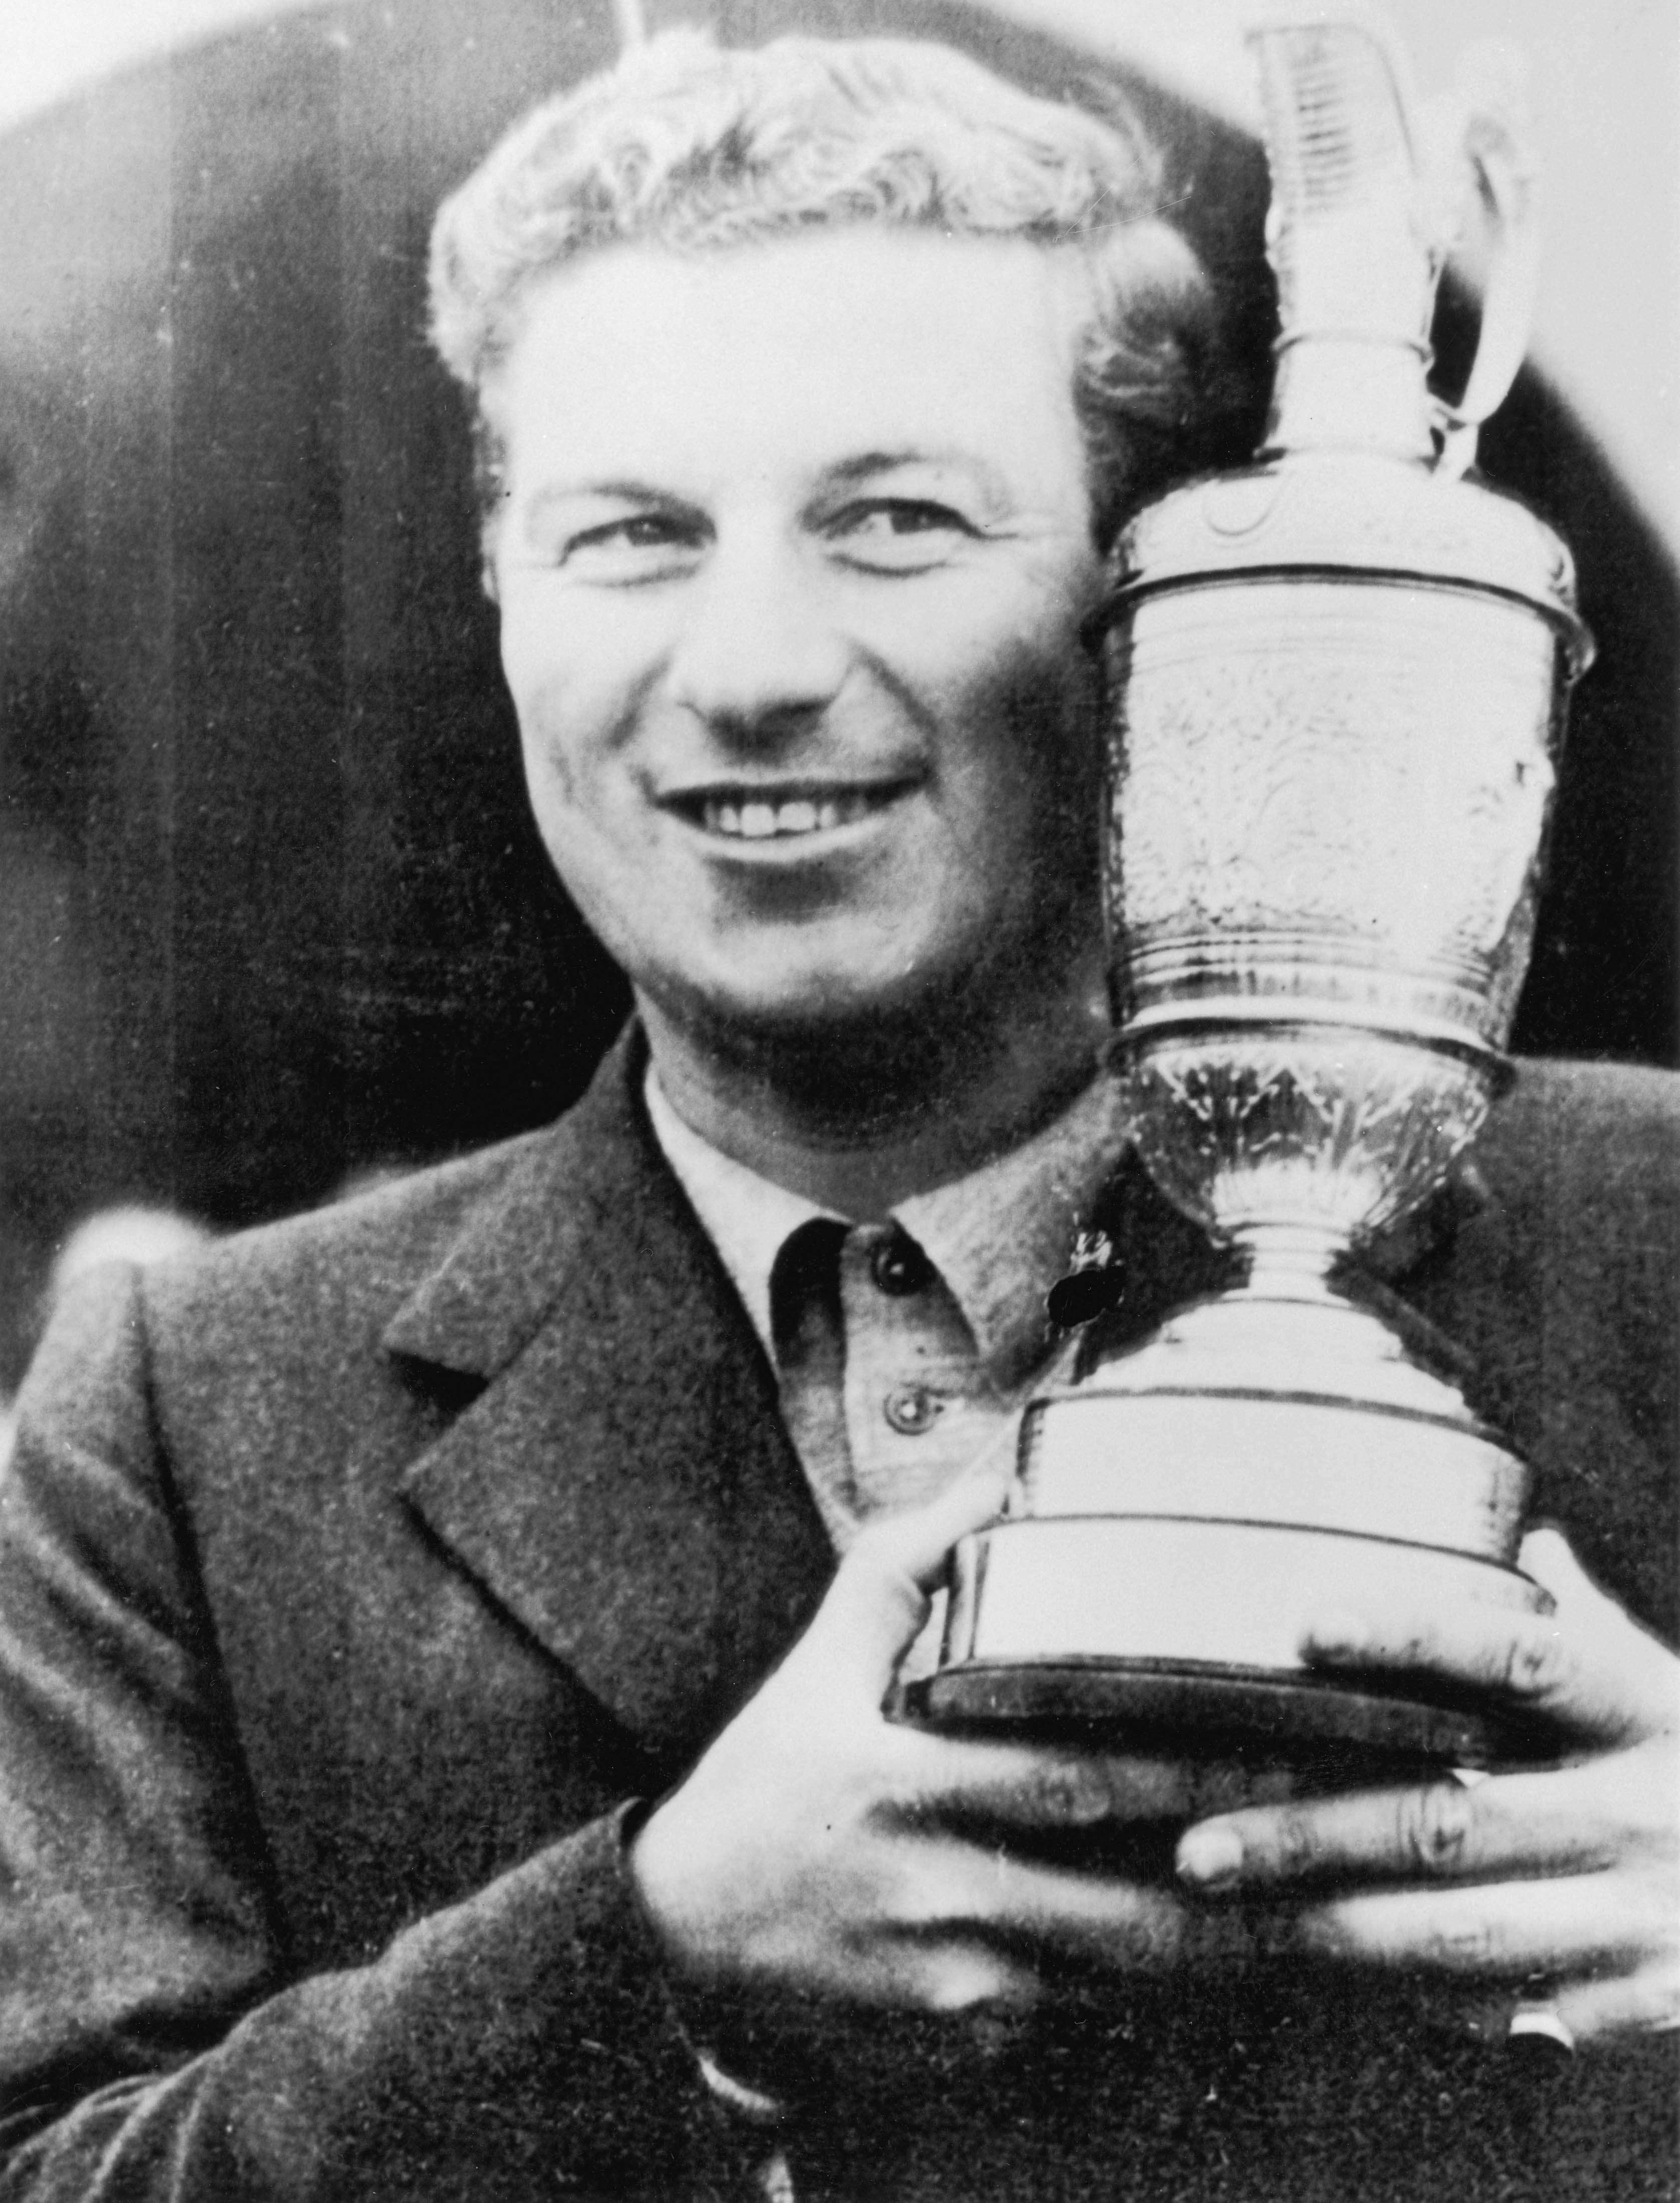 1956: Peter Thomson